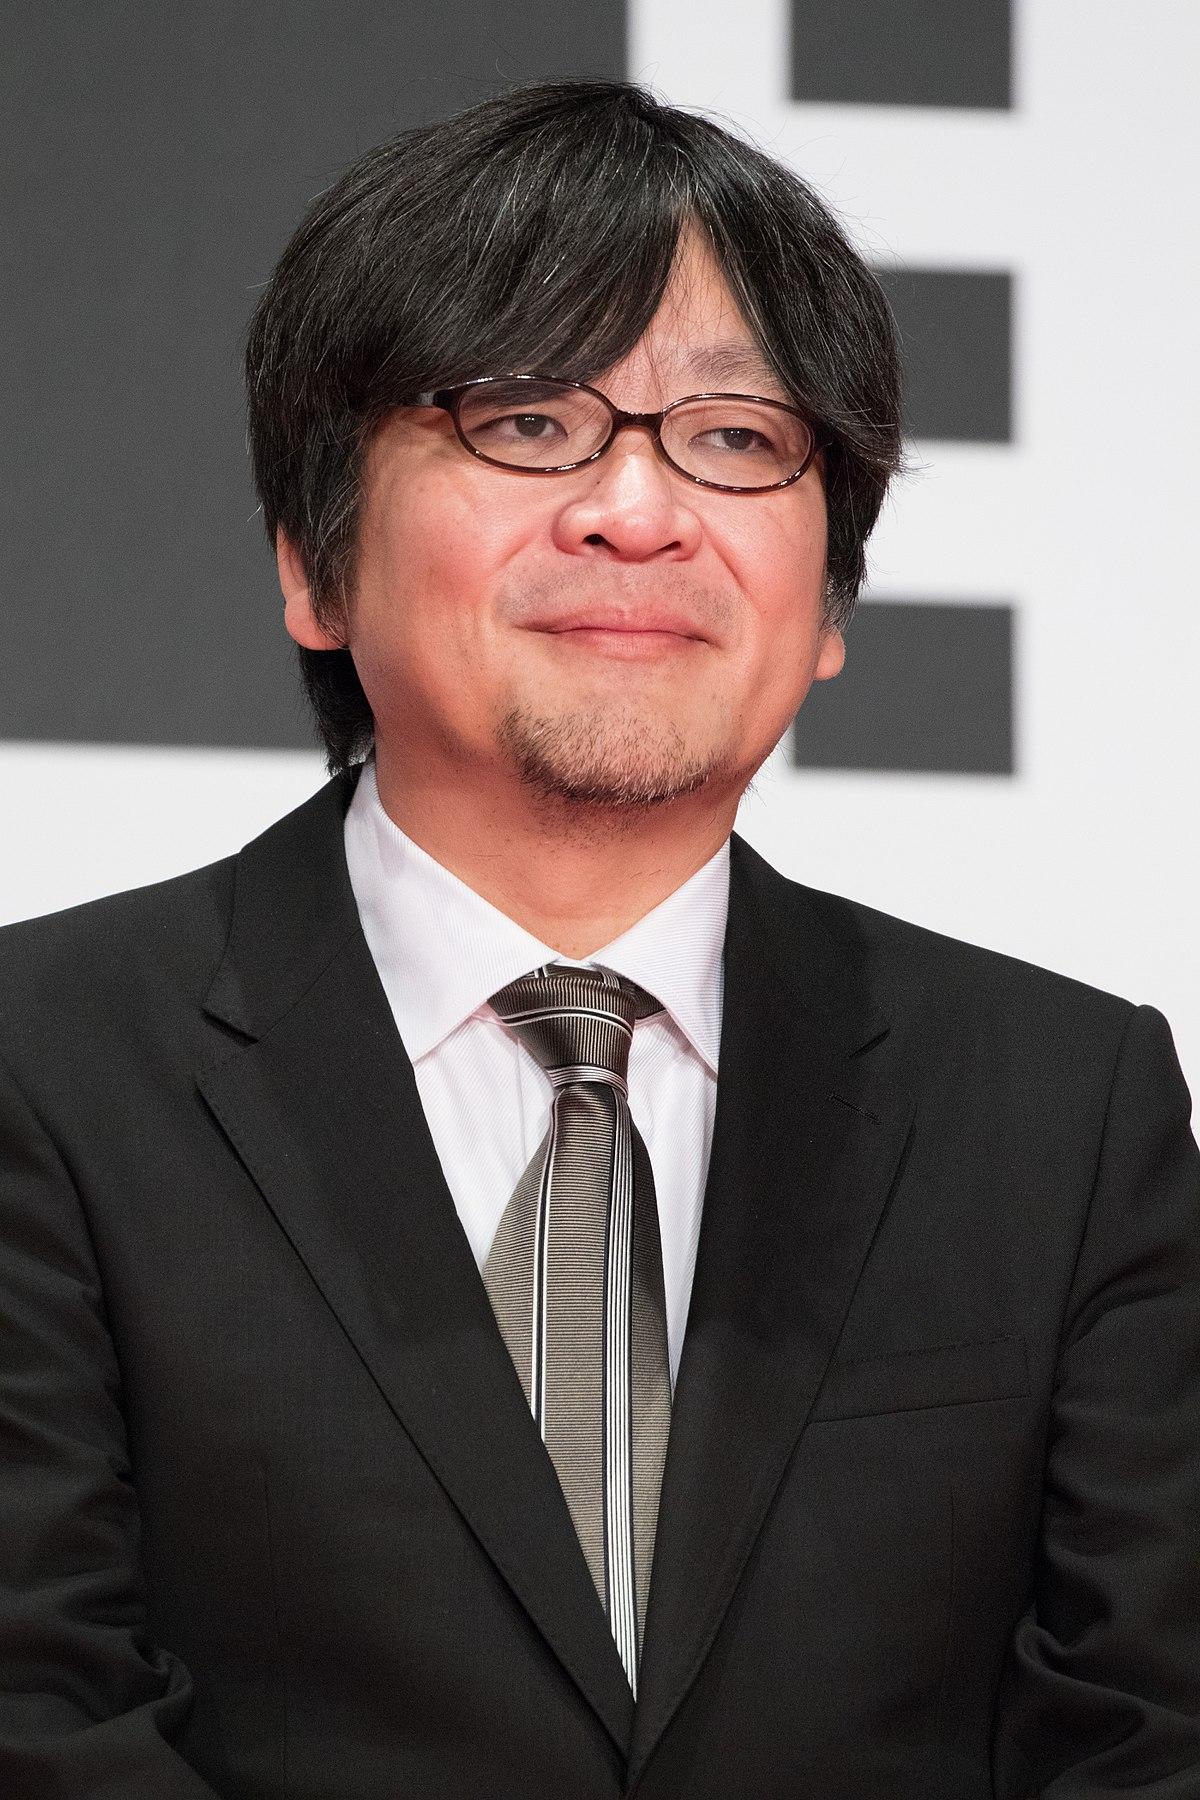 細田守 - Wikipedia